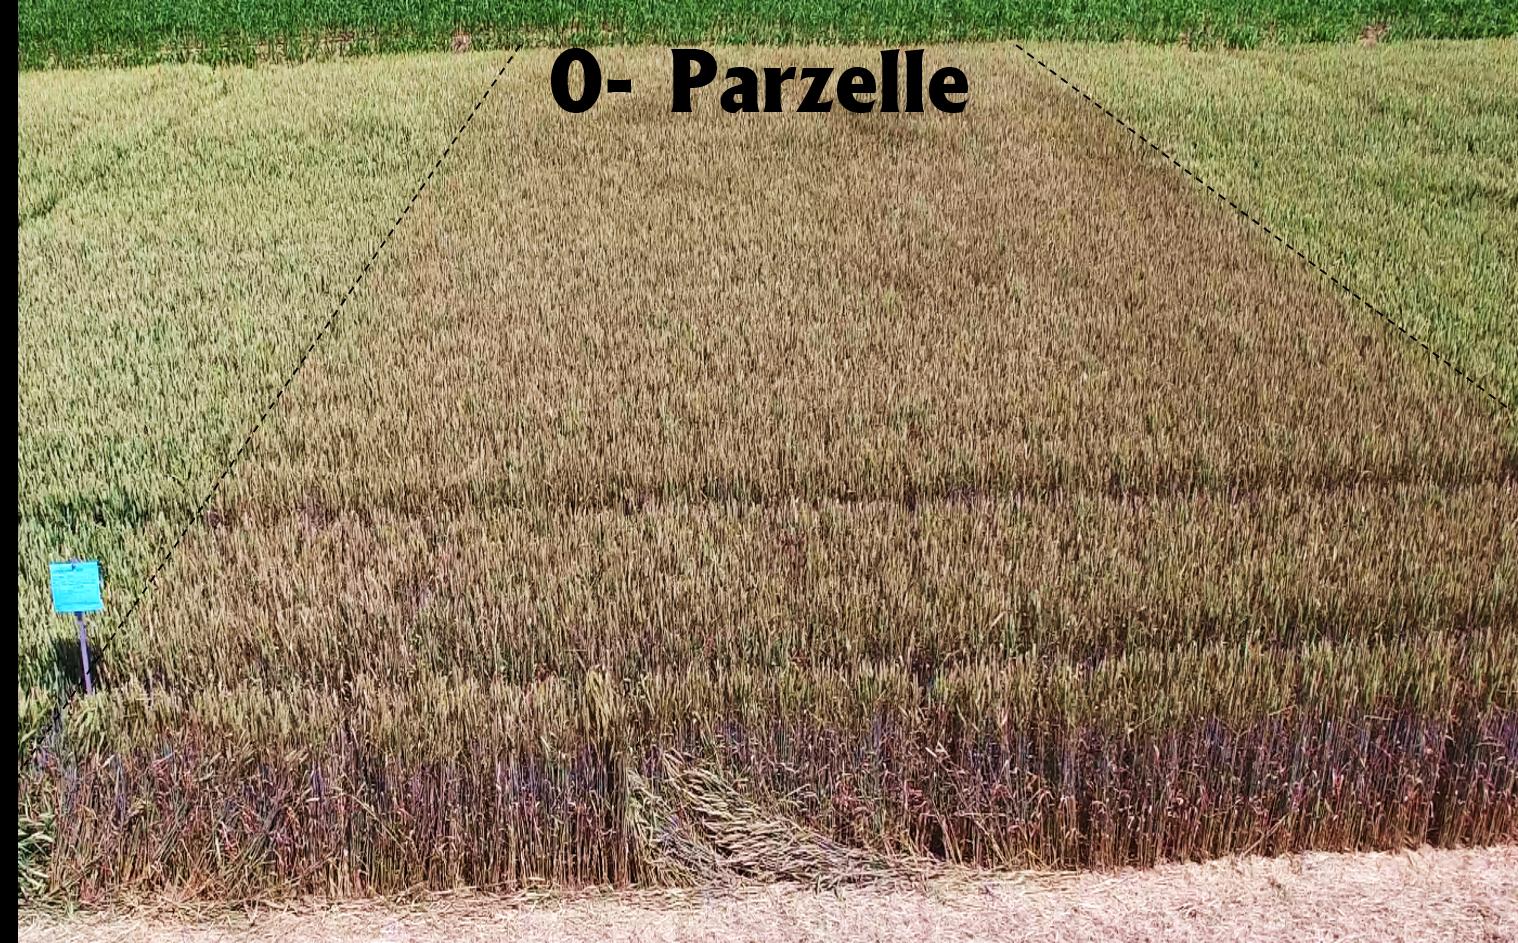 0-Parzelle